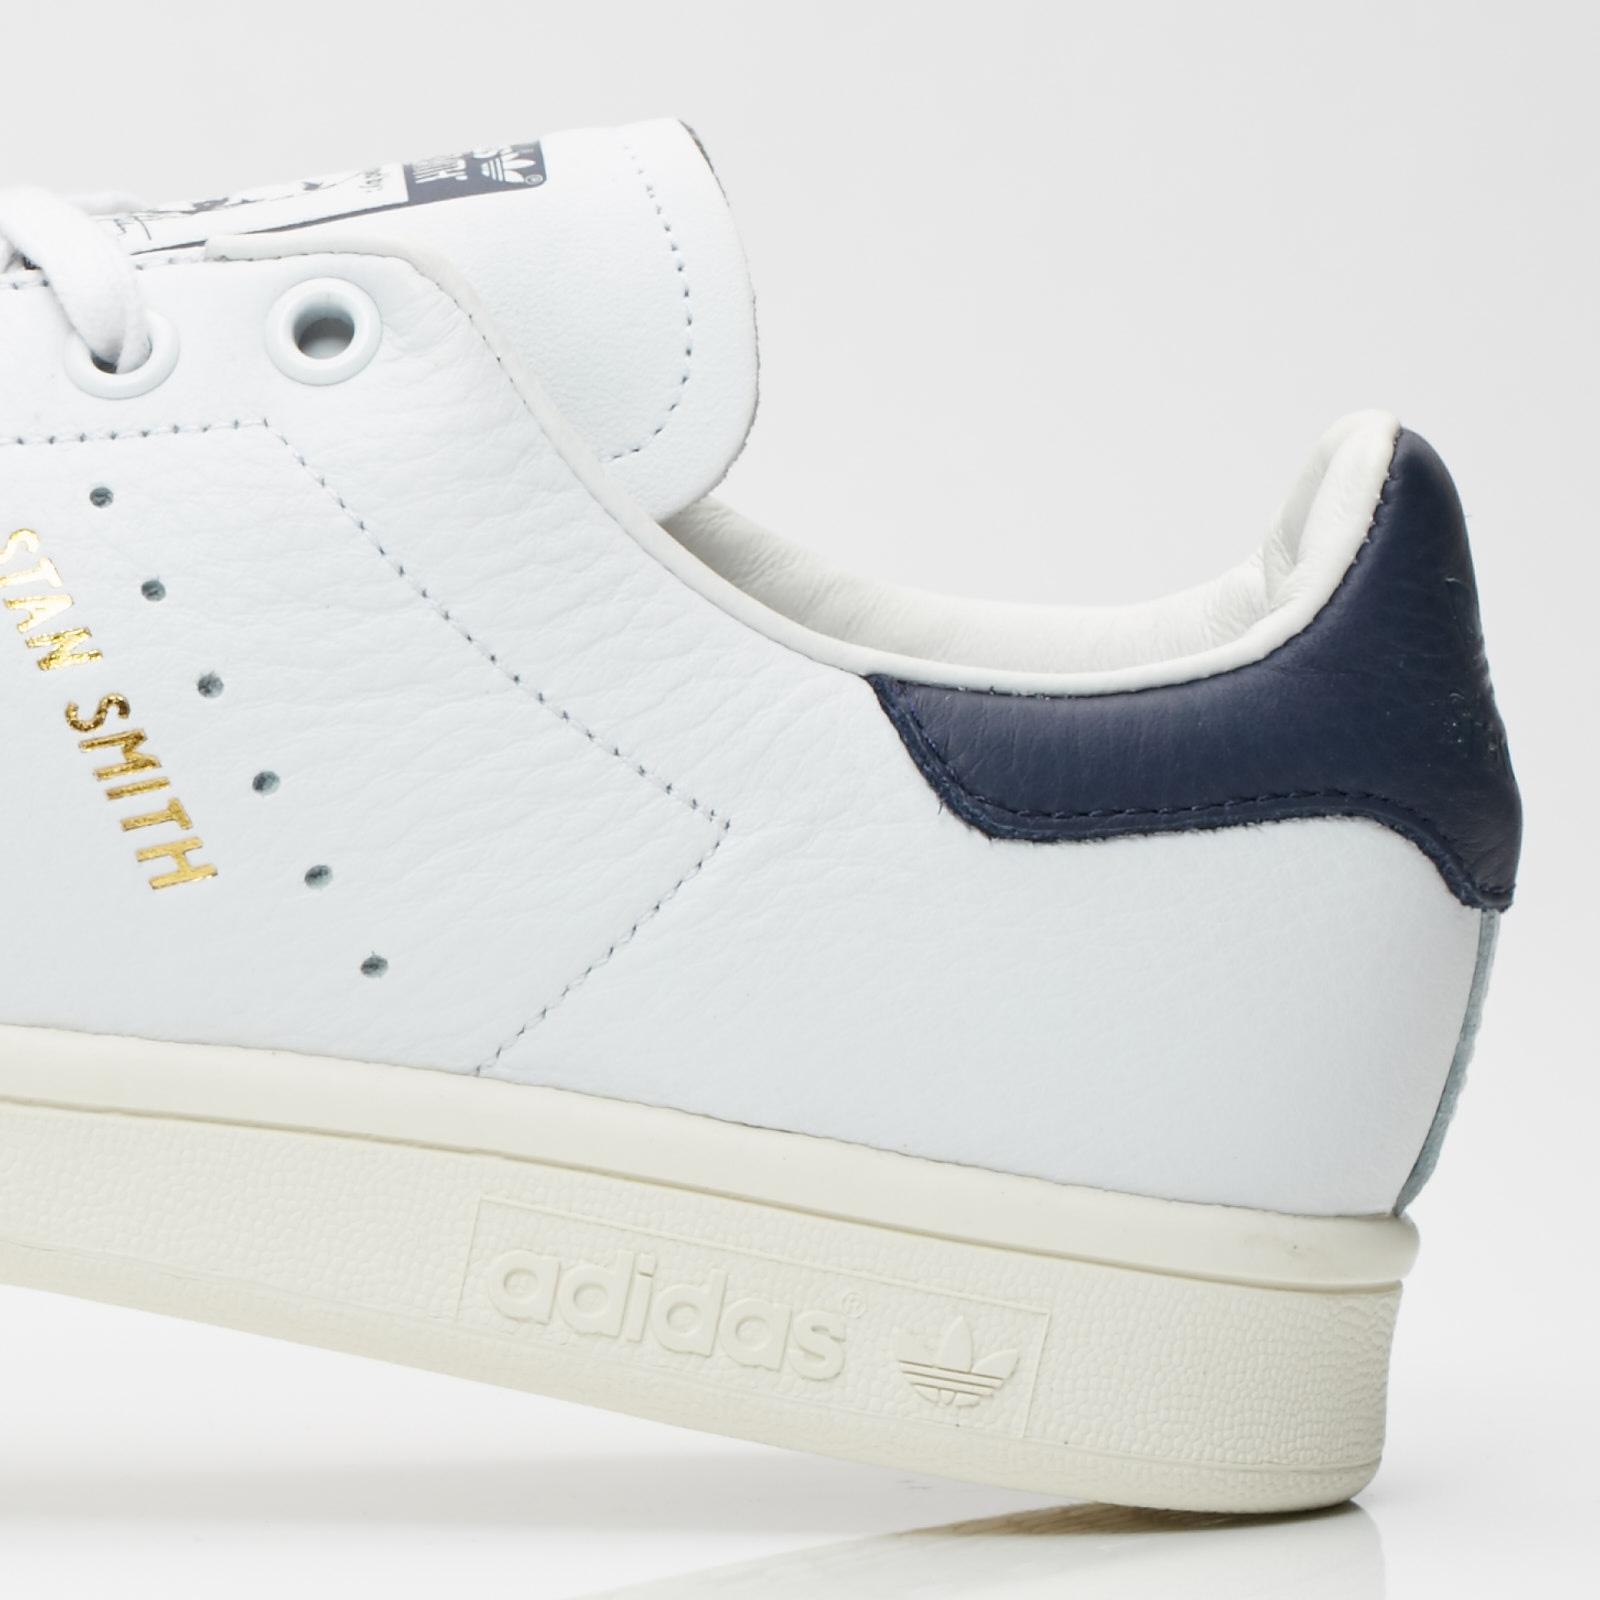 f58e419c7c0 adidas Stan Smith - Cq2870 - Sneakersnstuff